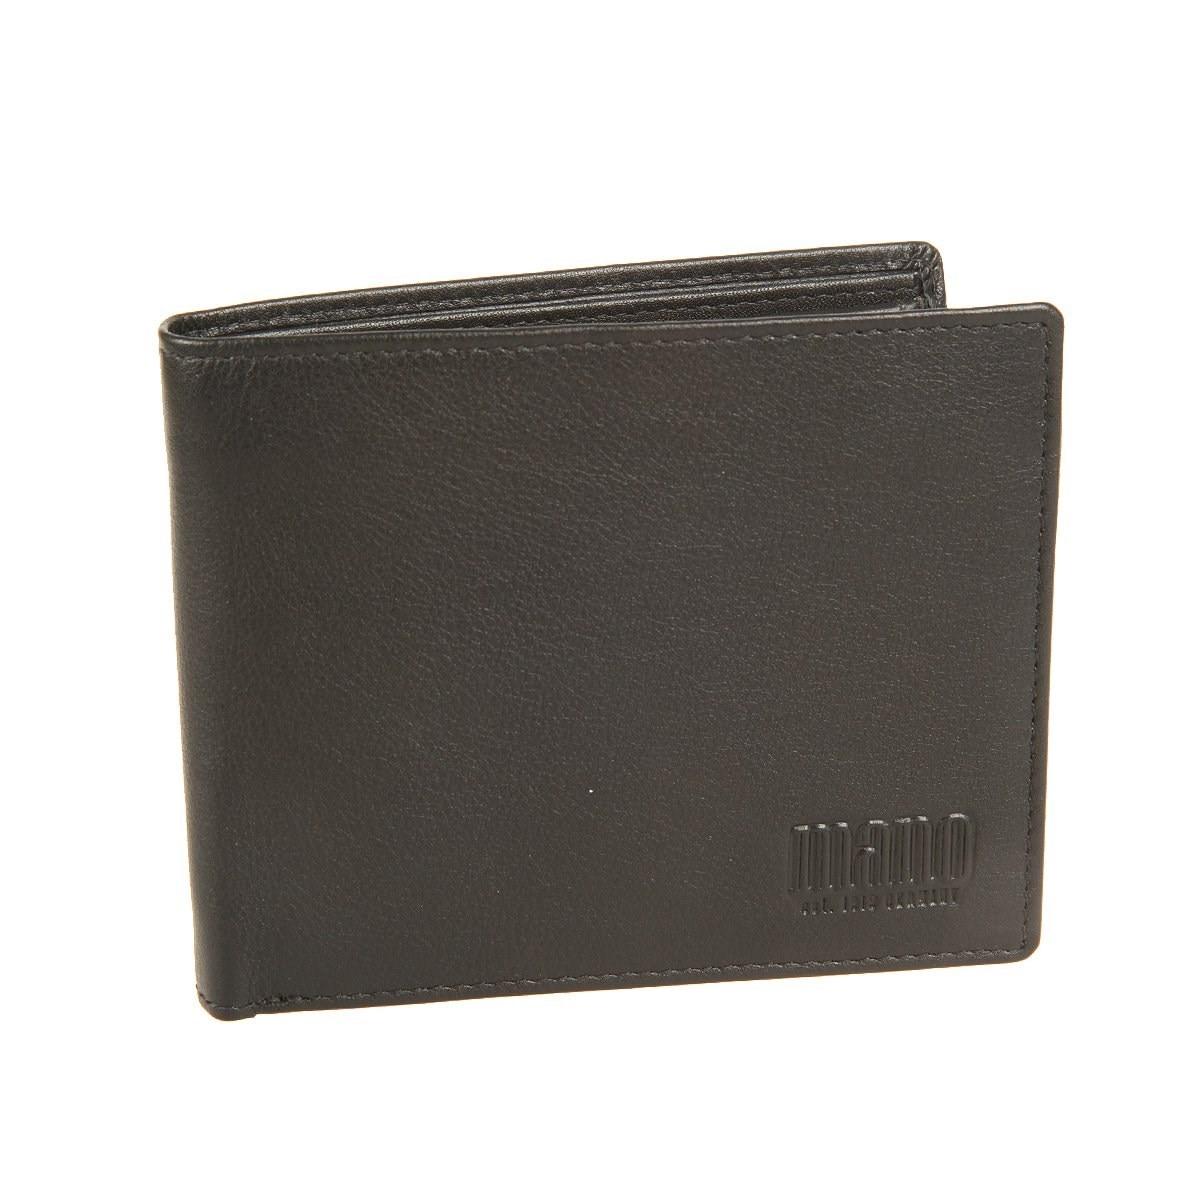 Coin Purse Mano 14660/3 black women 3 cute cat short wallet animal printing purse card holder coin bags